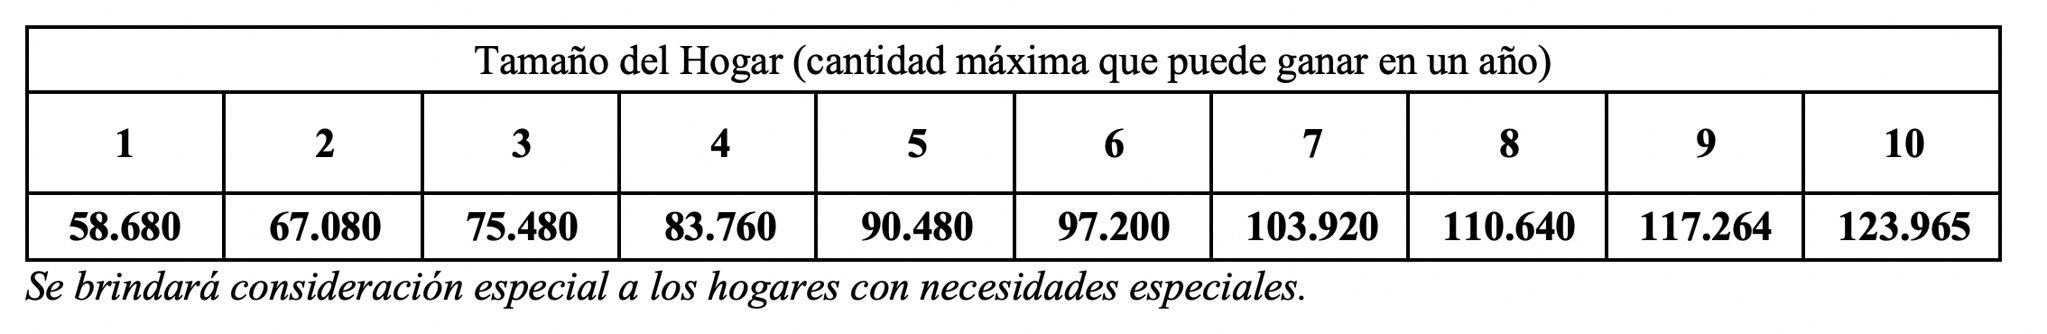 AMI chart spanish